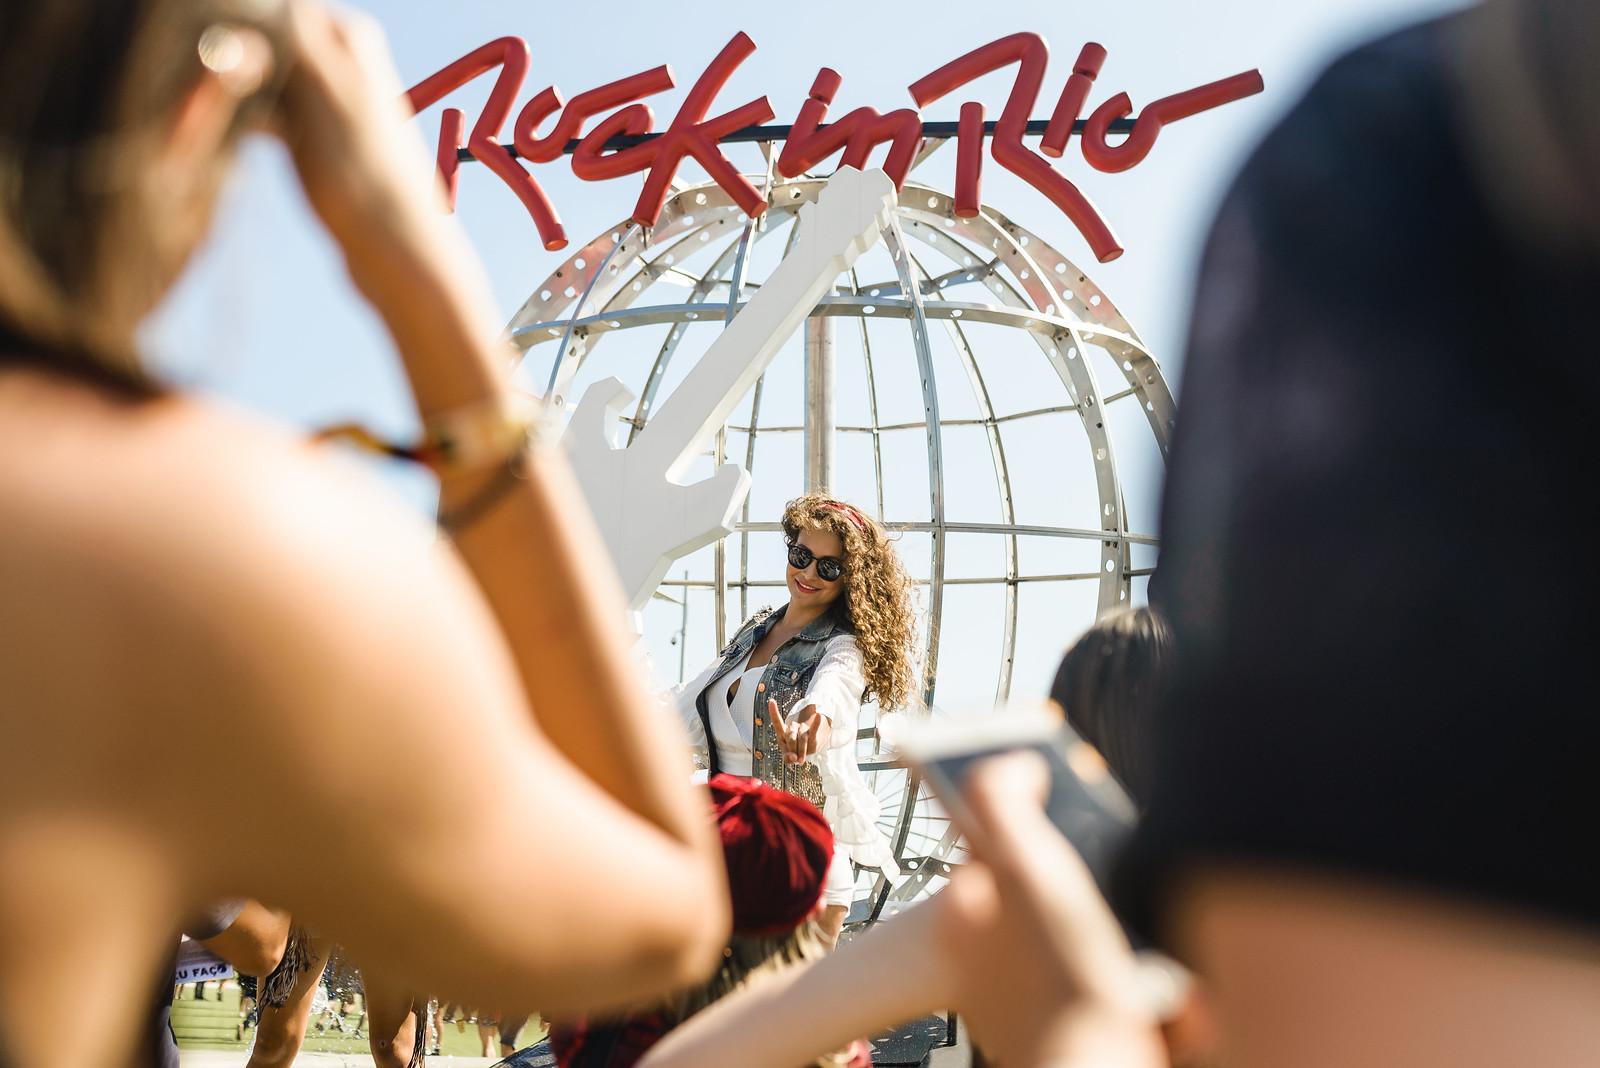 Rock in Rio. Foto: Divulgação / I Hate Flash